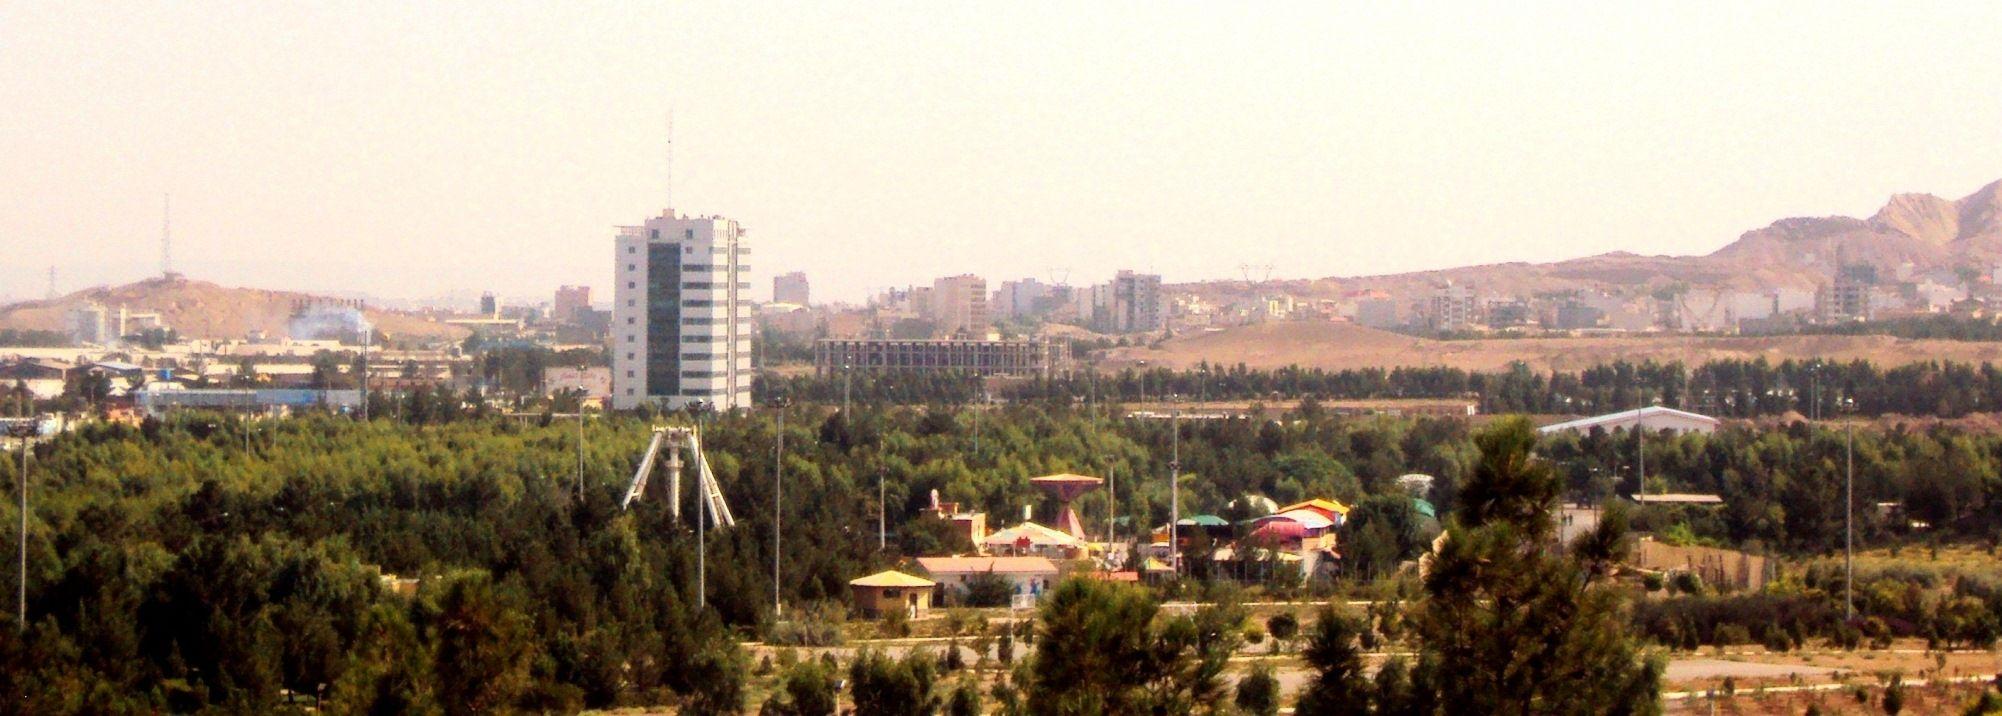 Panorama Kom (fot. Mohammad mahdi P9432, Creative Commons Attribution-Share Alike 3.0 Unported)